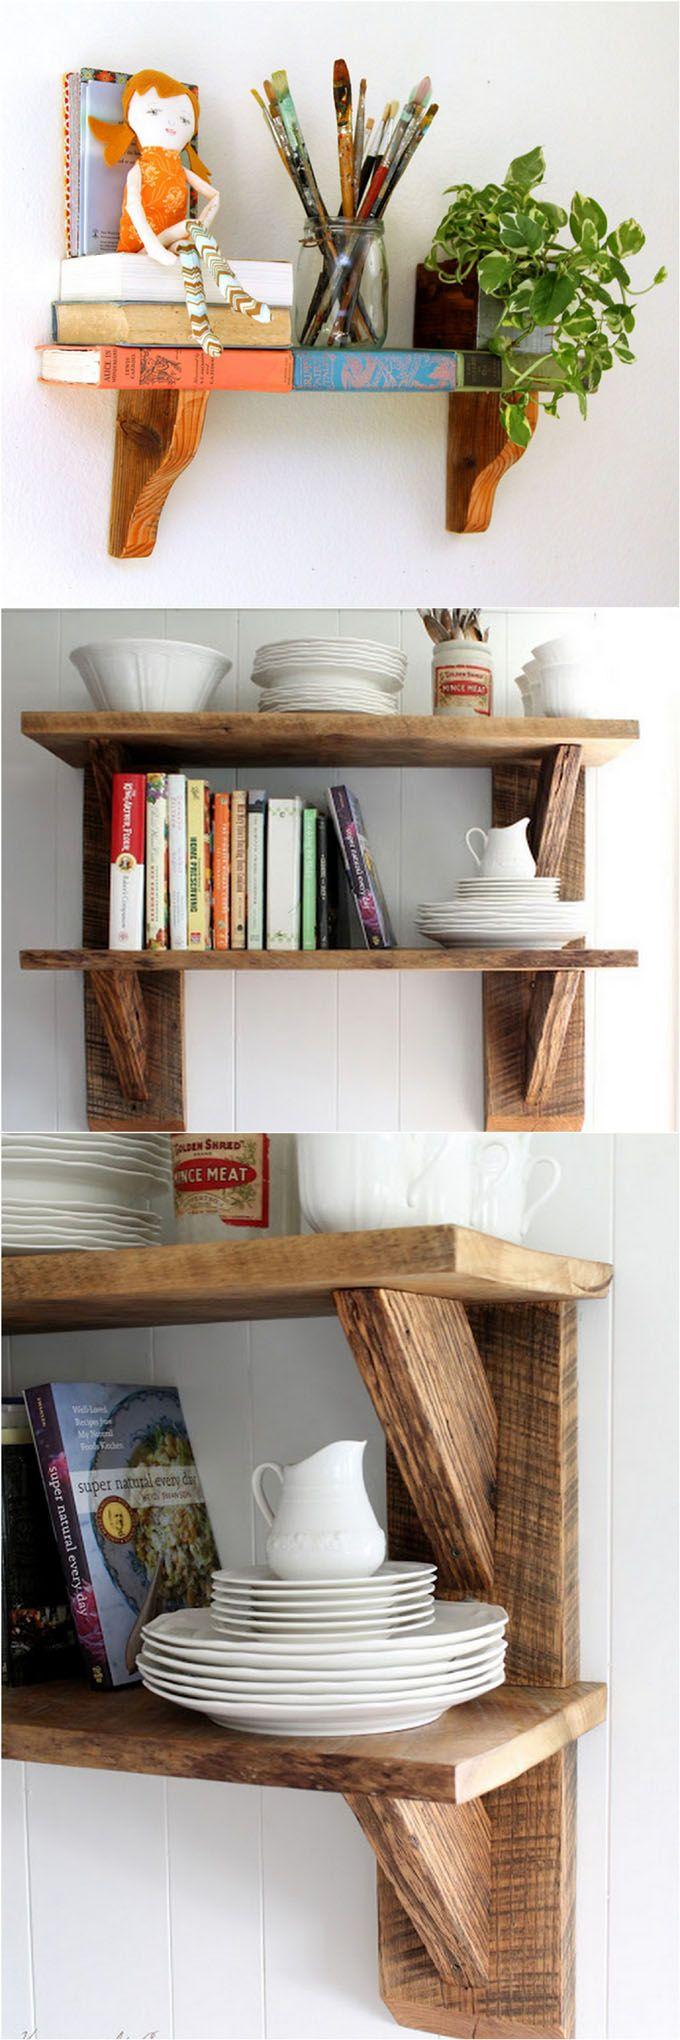 16 Easy And Stylish Diy Floating Shelves Amp Wall Shelves